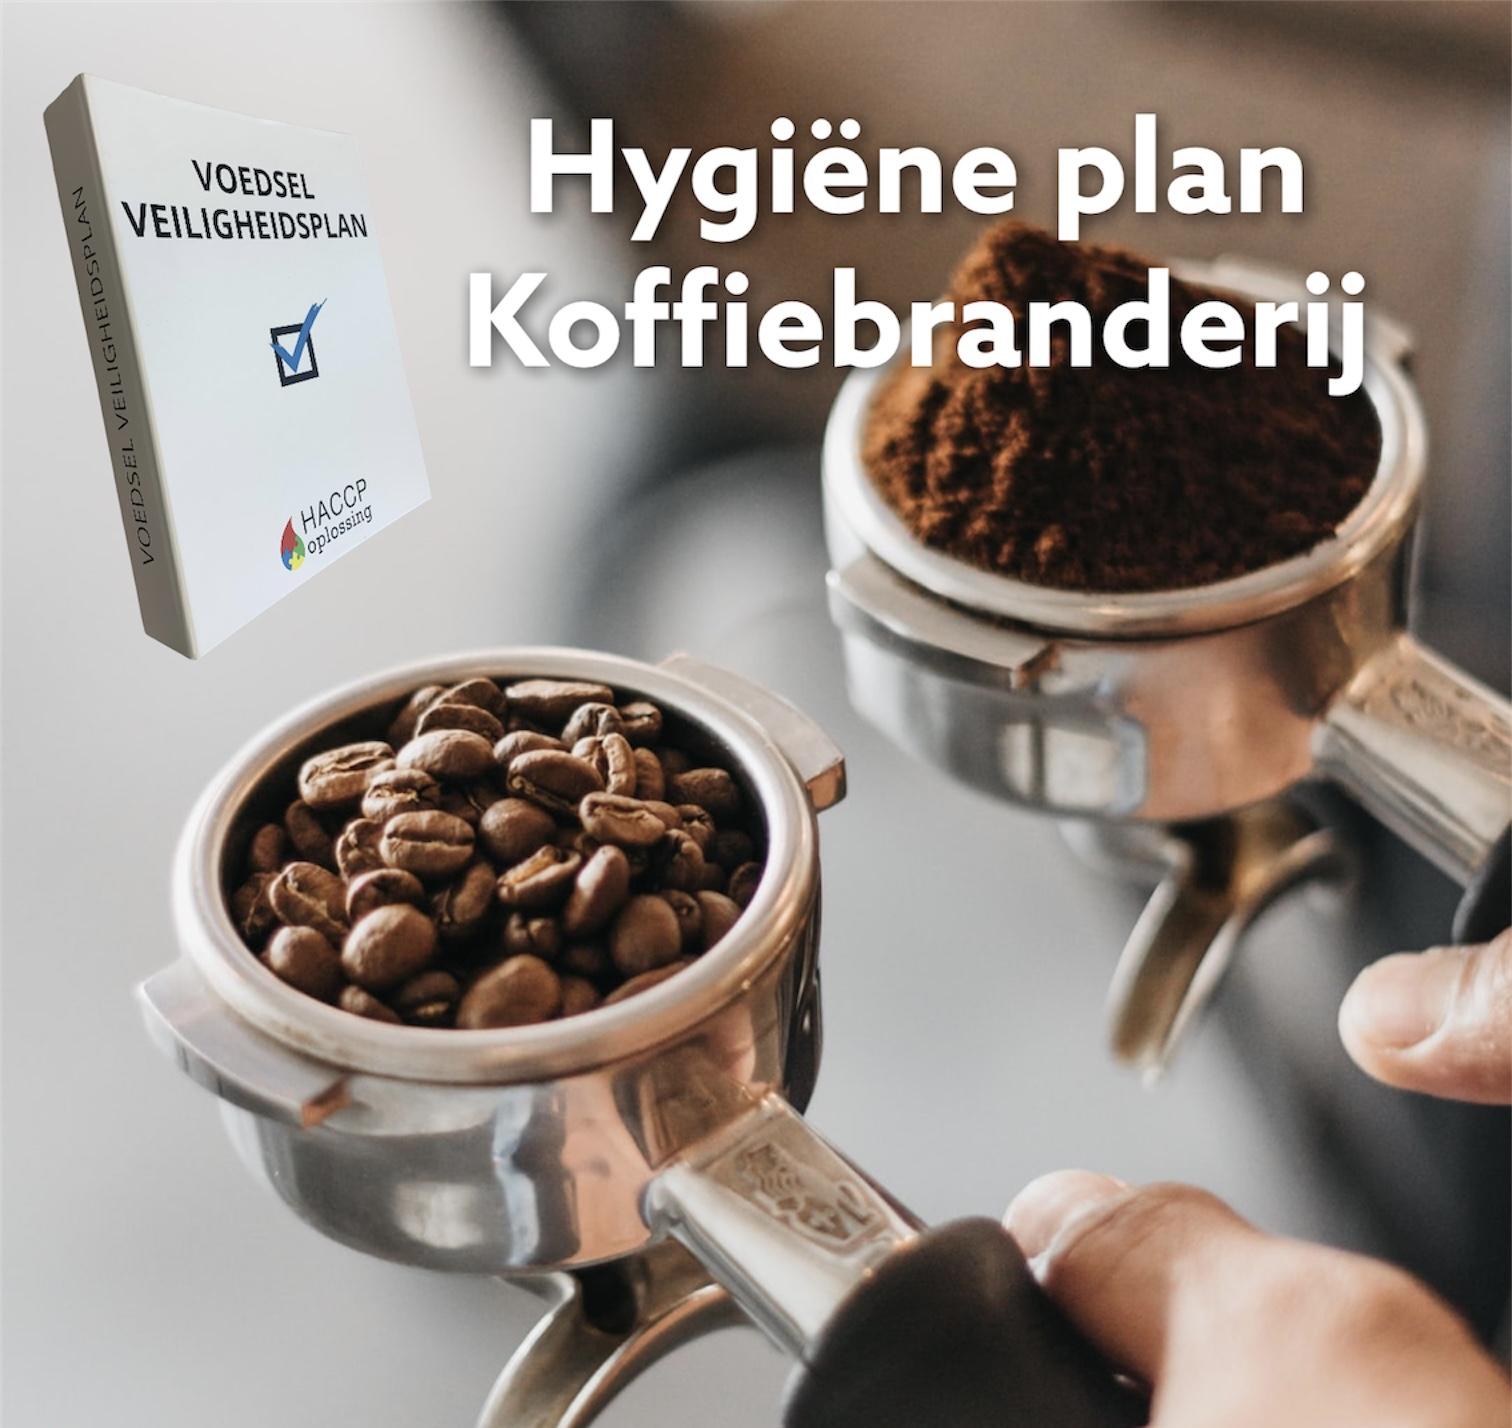 Hygieneplan koffiebranderij